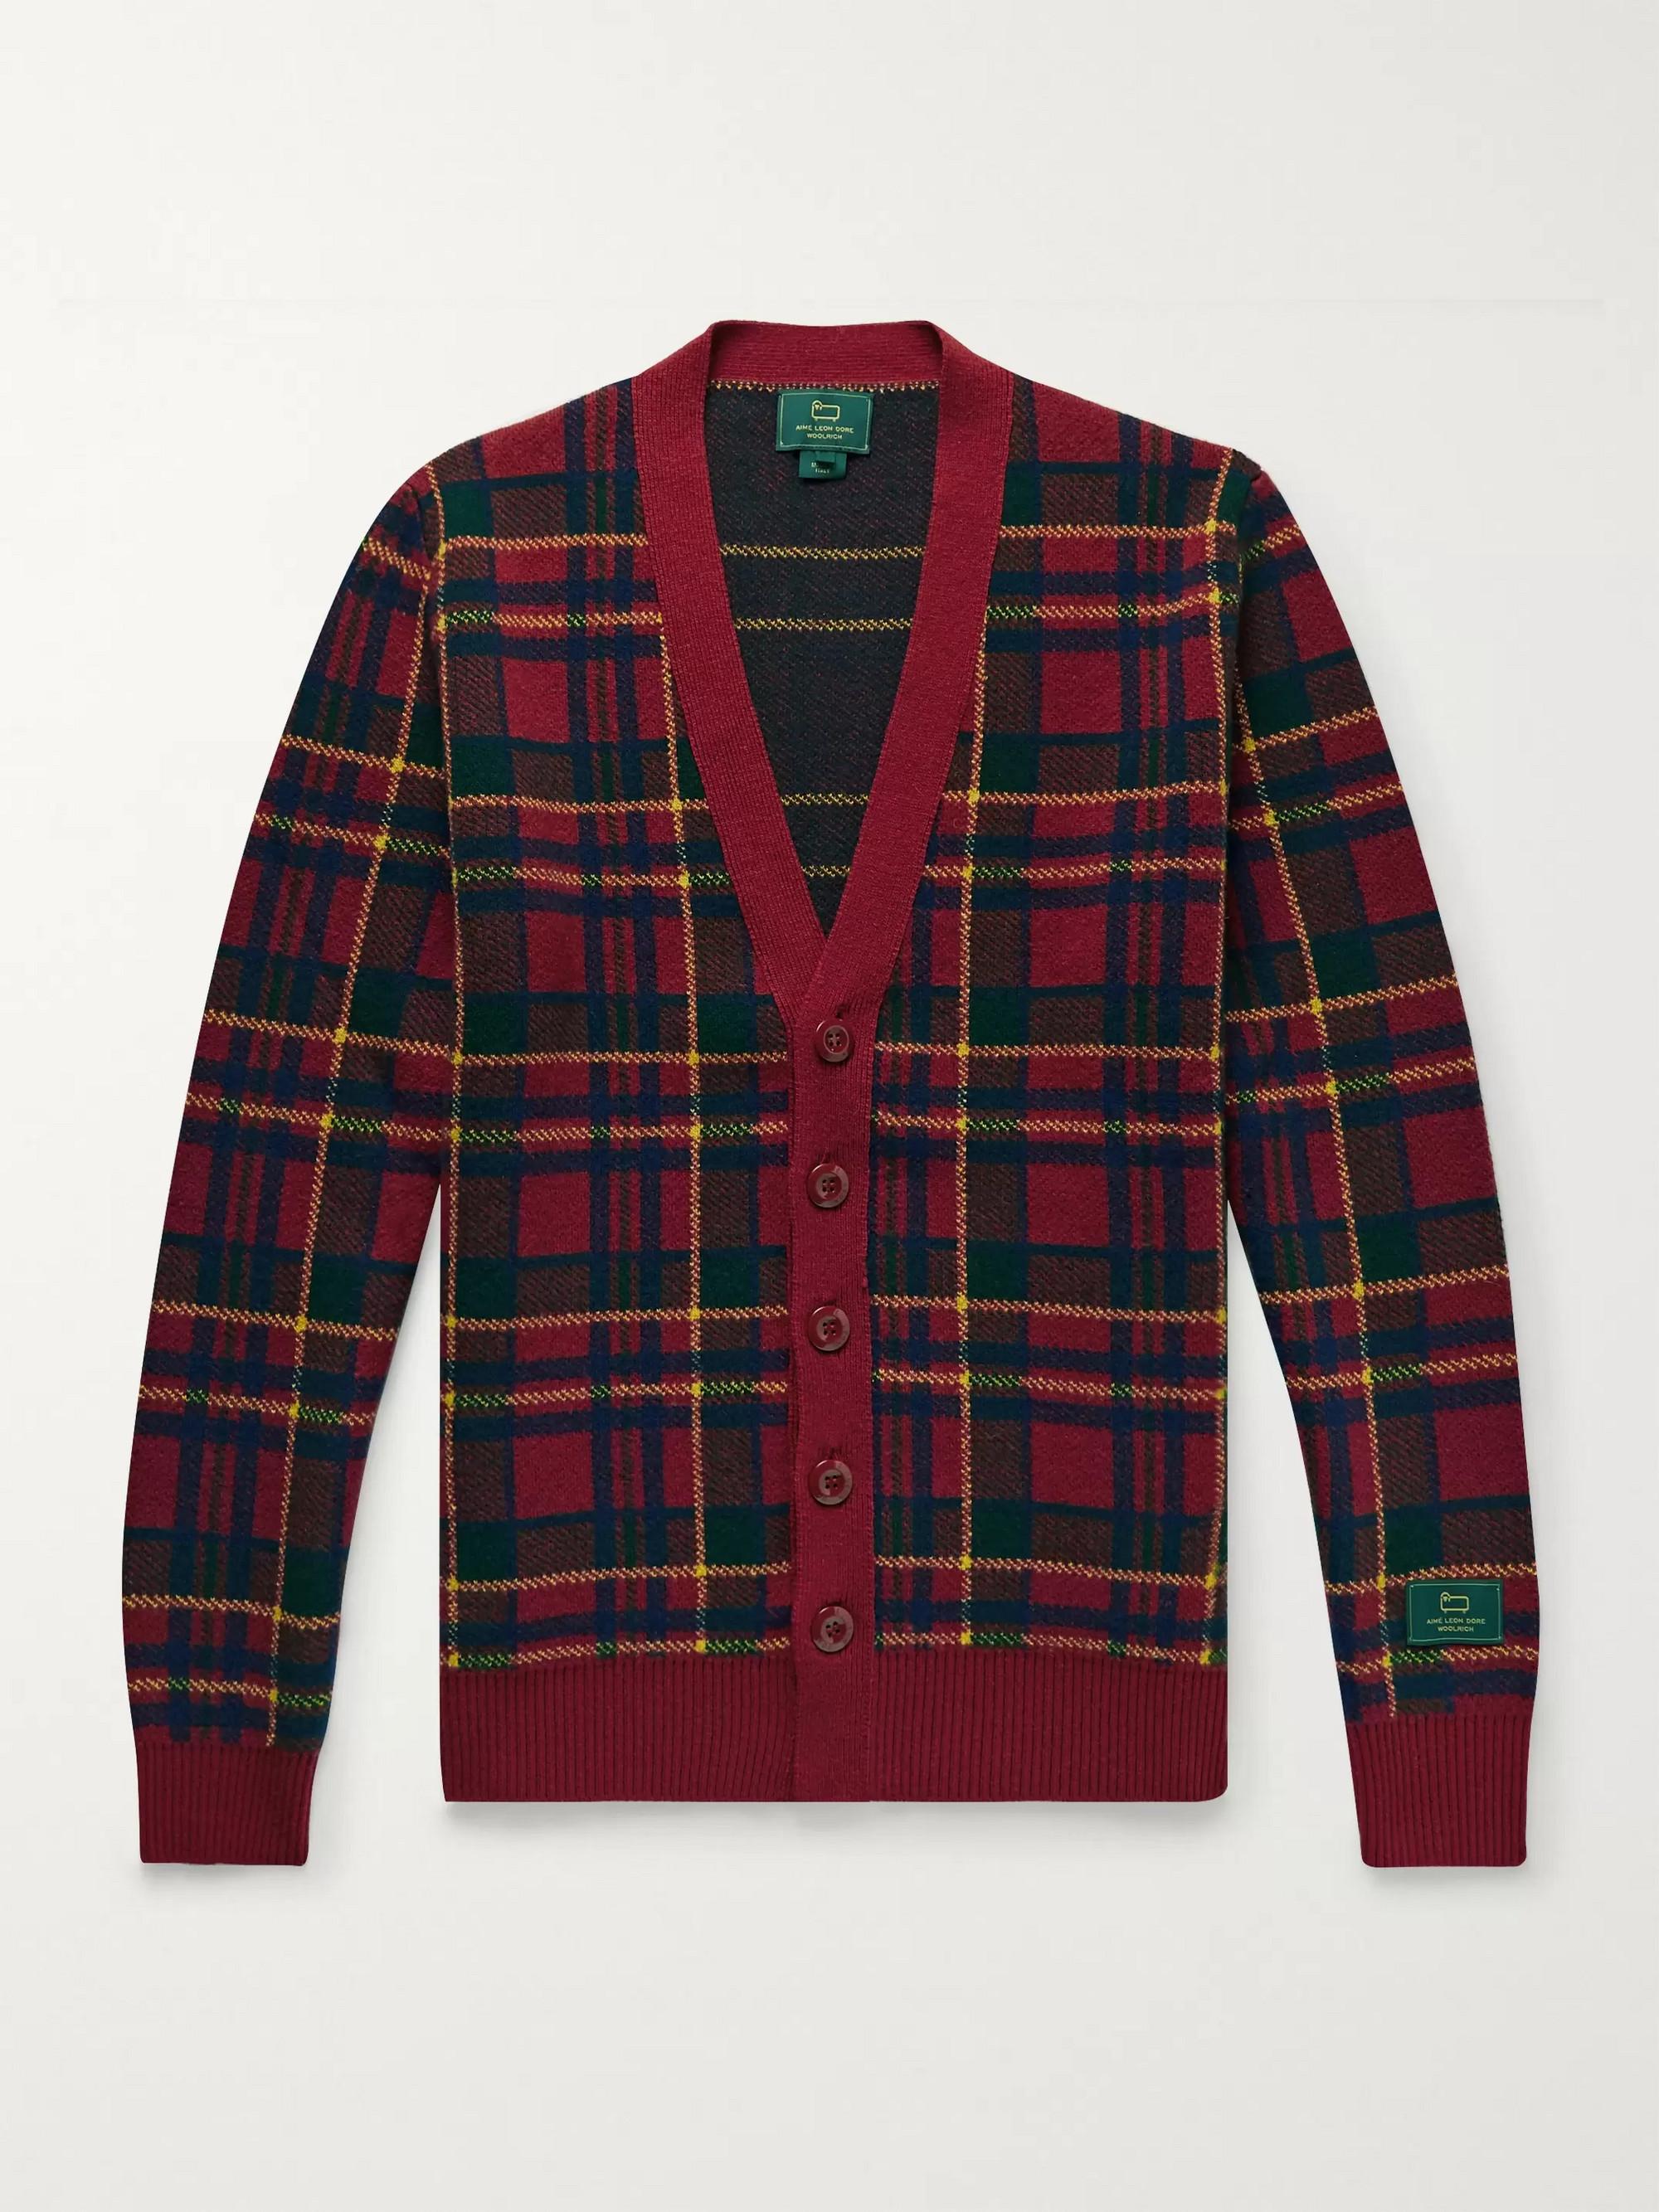 Aimé Leon Dore + Woolrich Checked Wool Cardigan